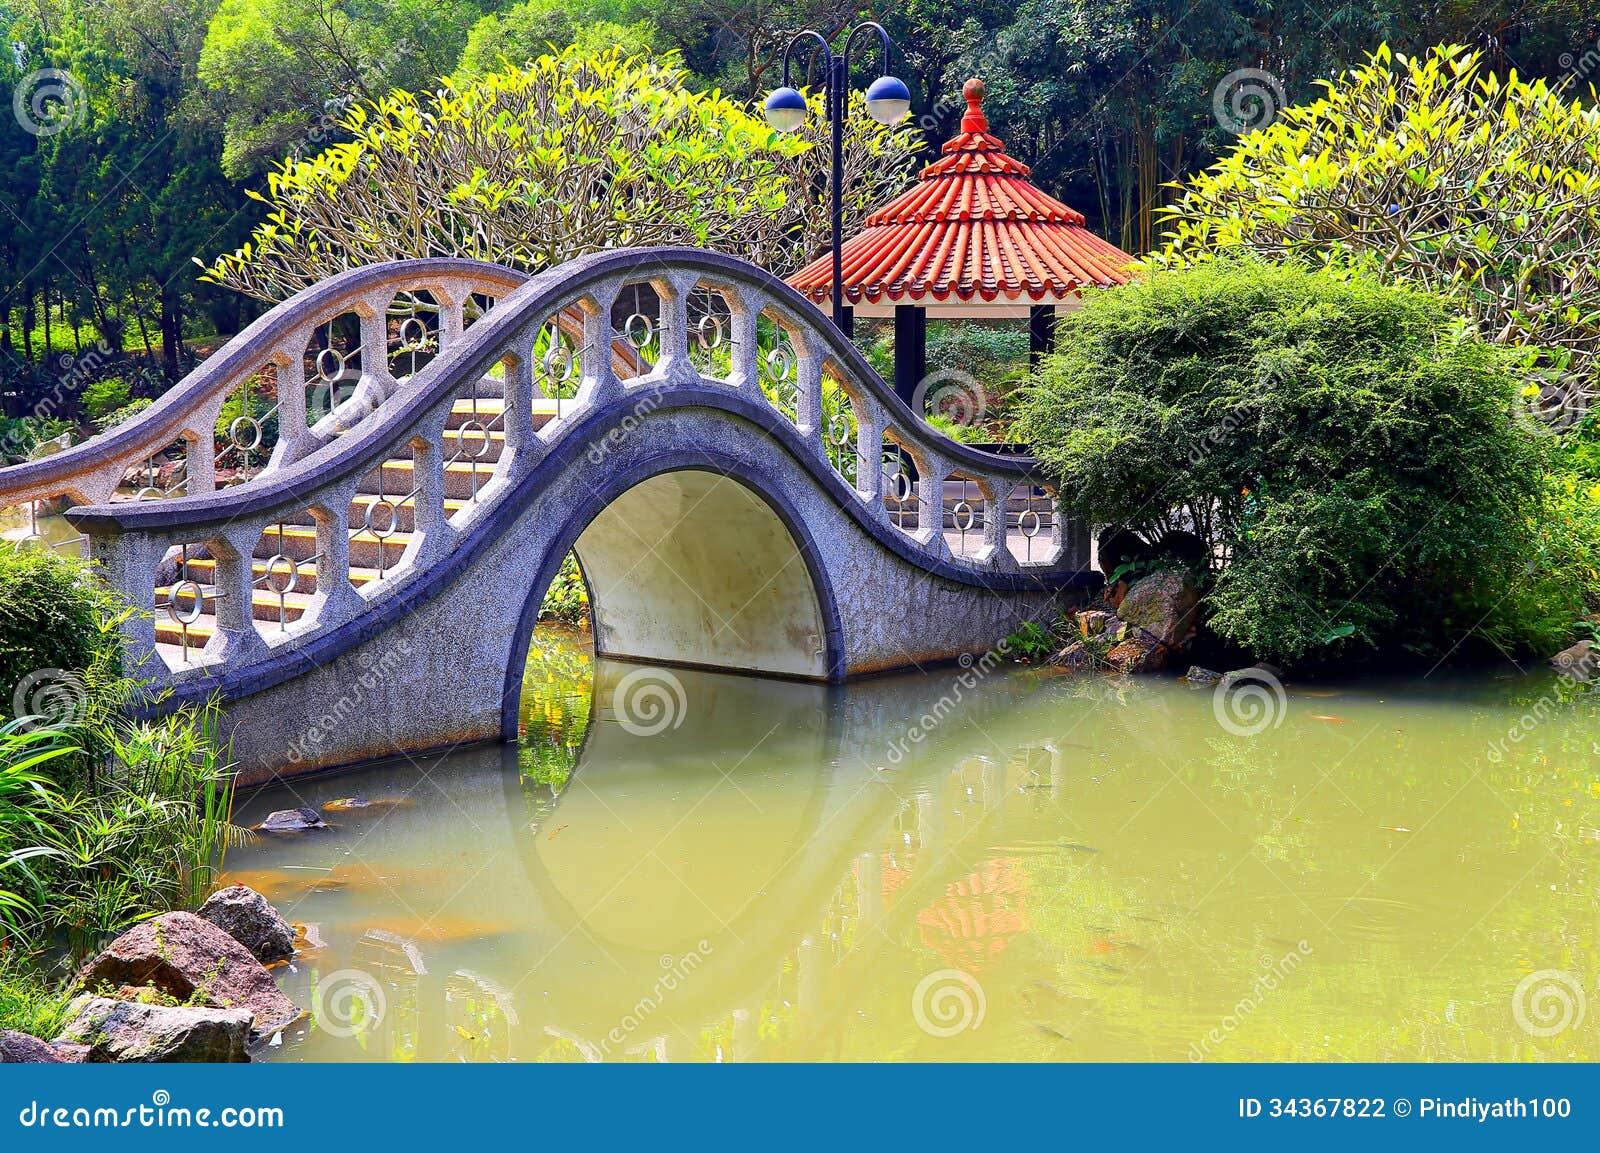 Zen garden with arch shape bridge stock photo image for Zen garden bridge